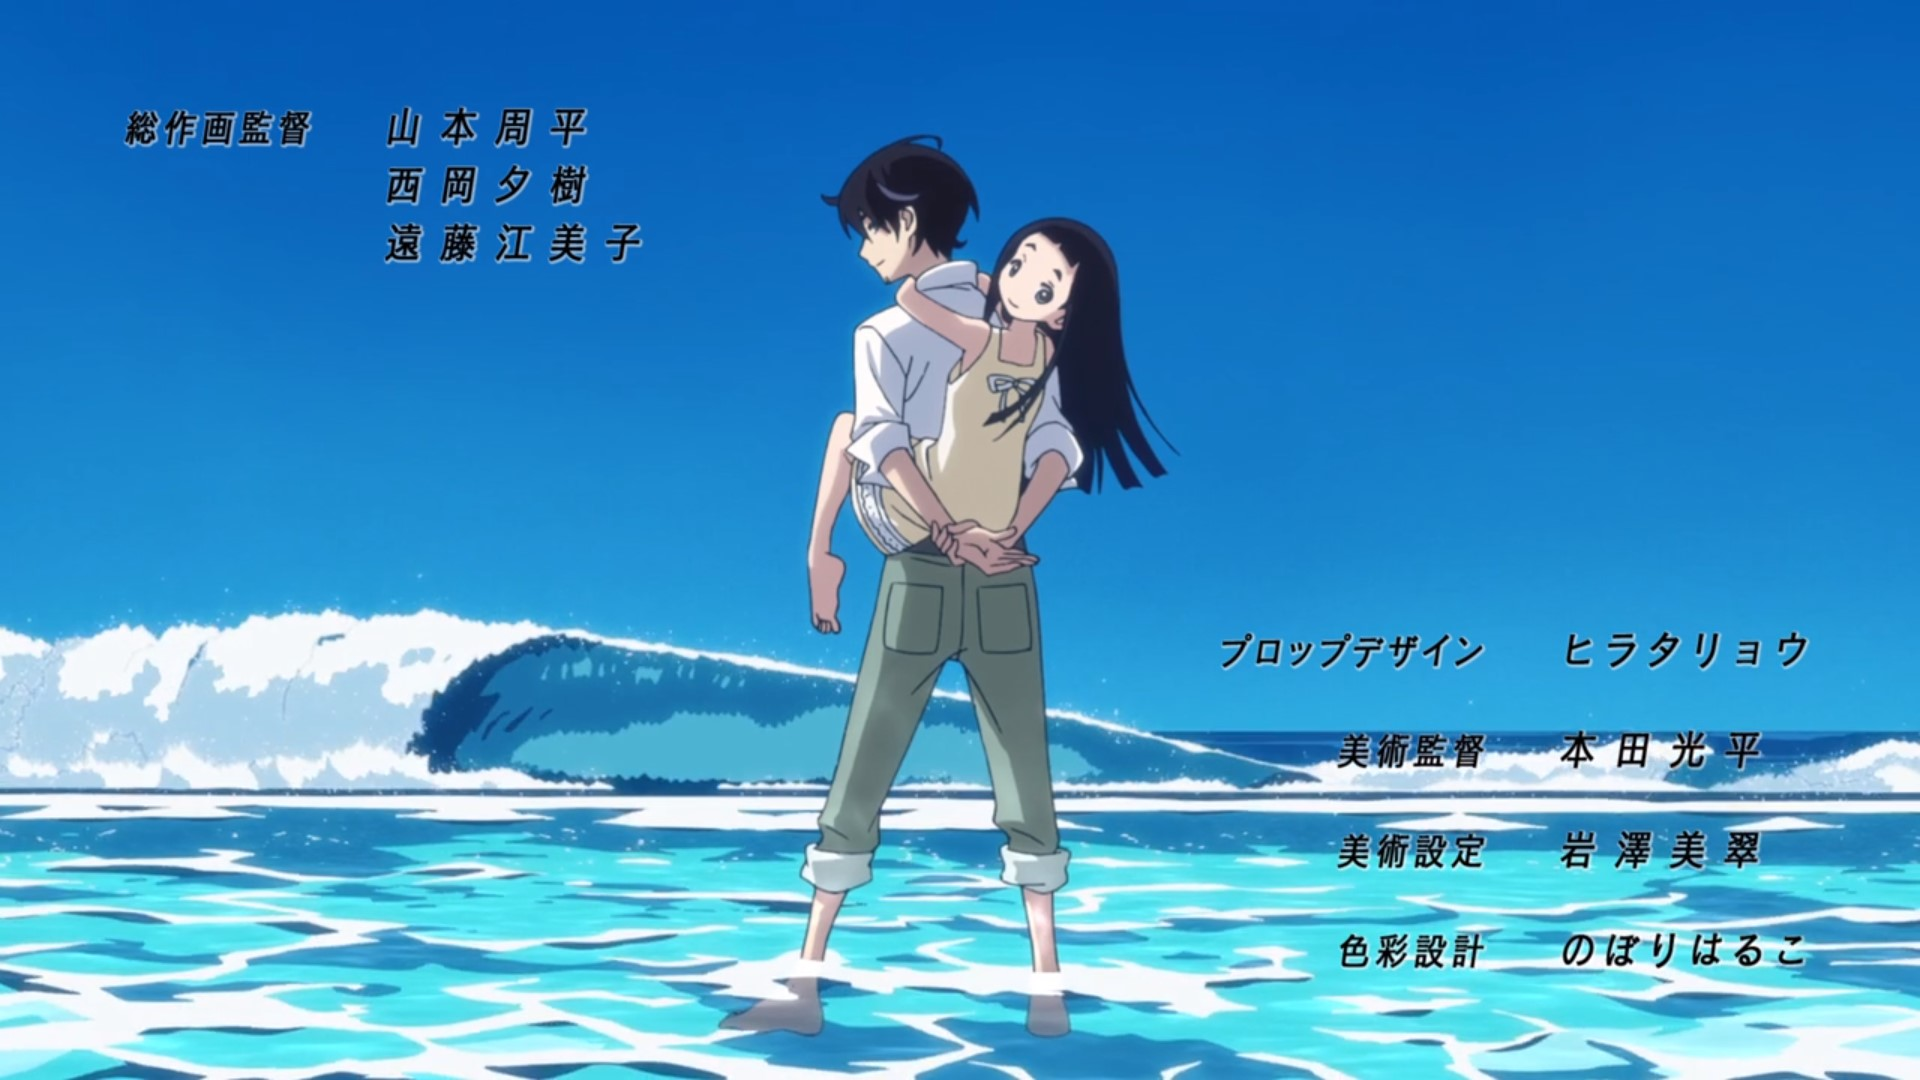 Opening de Kakushigoto reprenant une couverture du manga